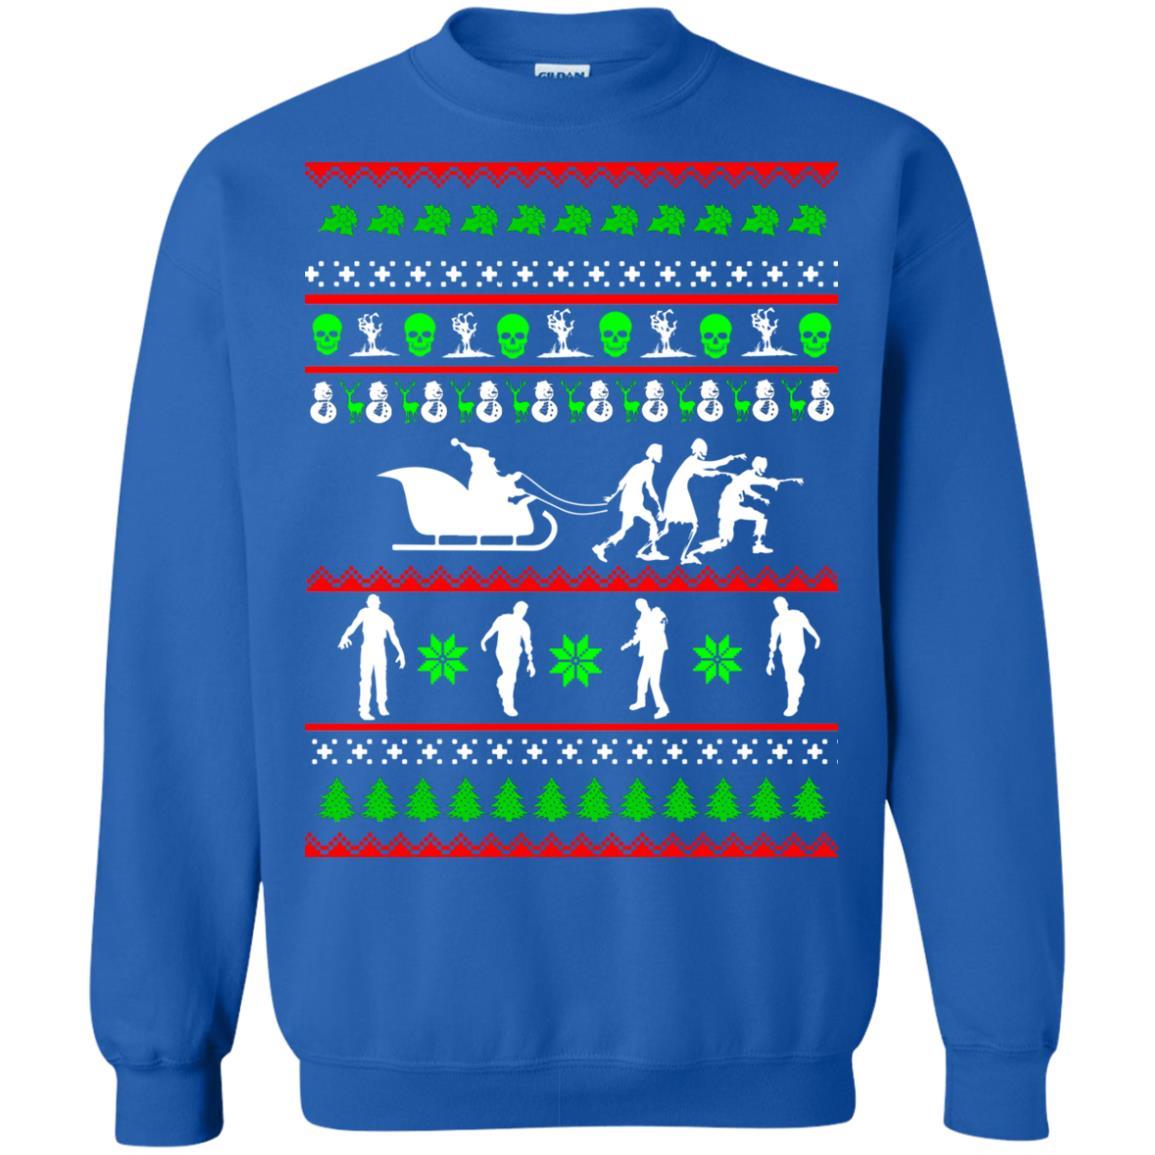 image 5839 - Zombie Christmas Sweater, Hoodie